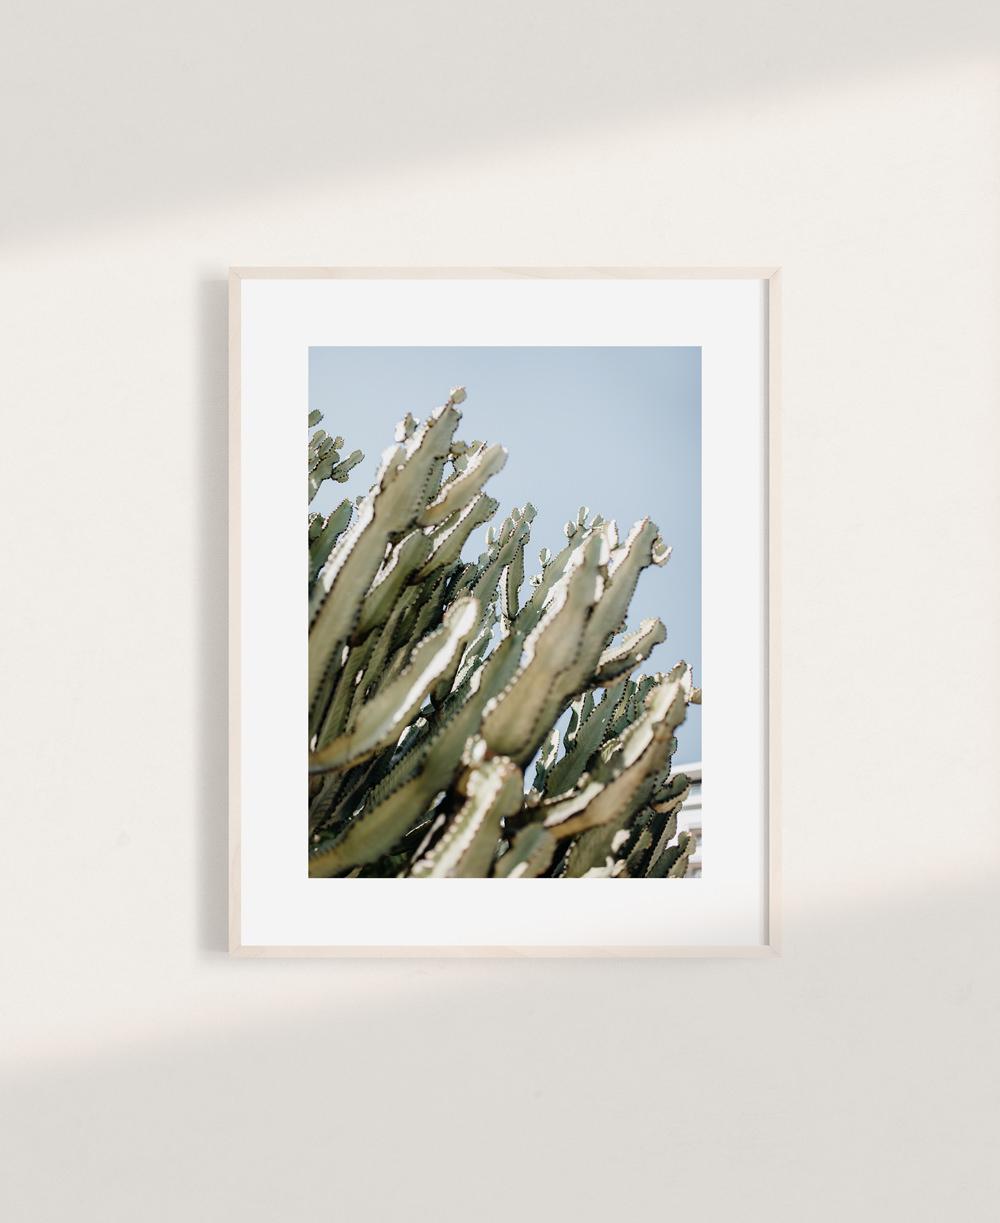 nicischwab-prints-013-kaktus